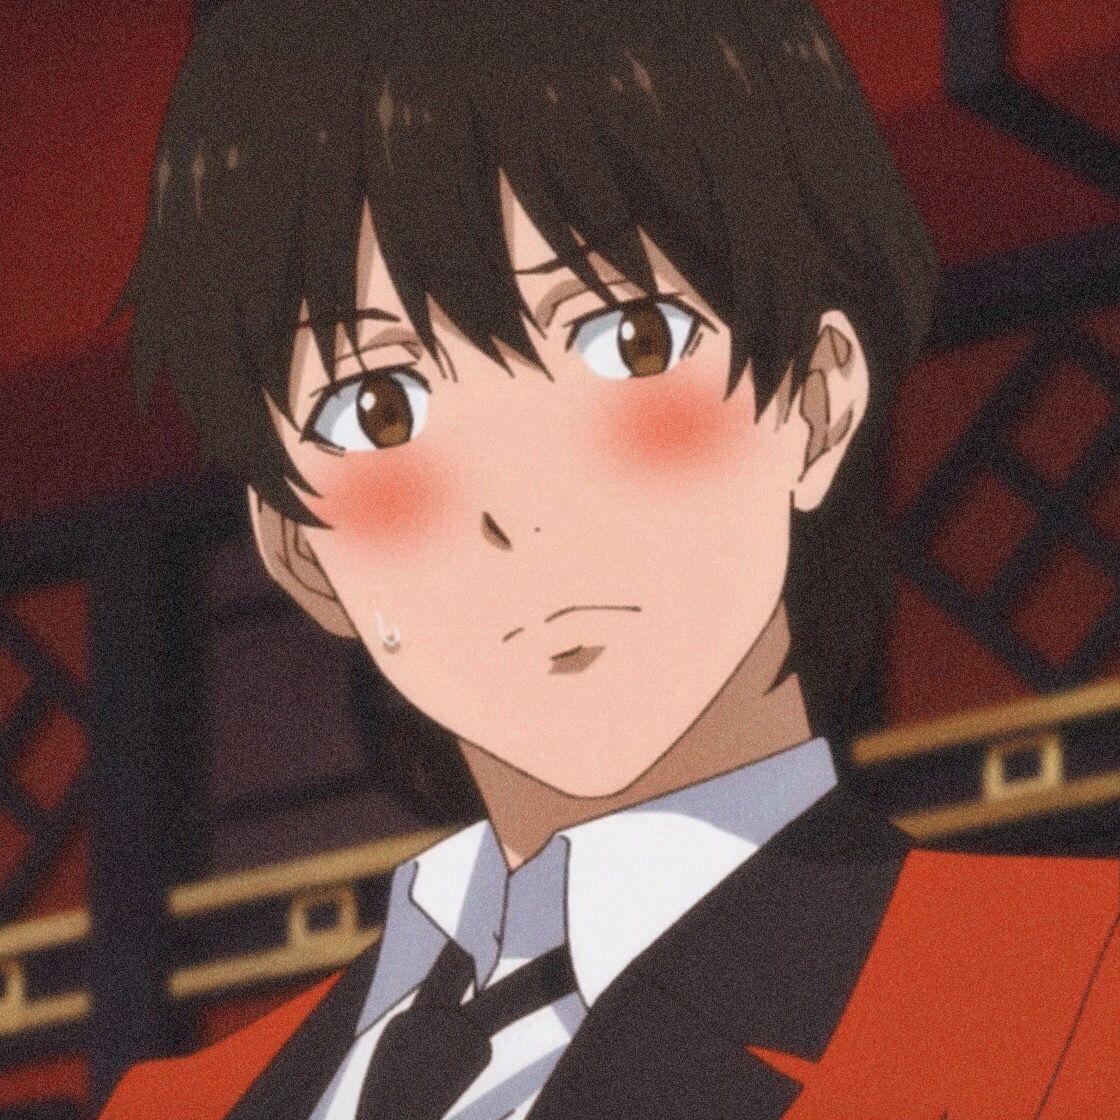 Pin By John Kirb Epler On Anime Icons Aesthetic Anime Anime Anime Shows